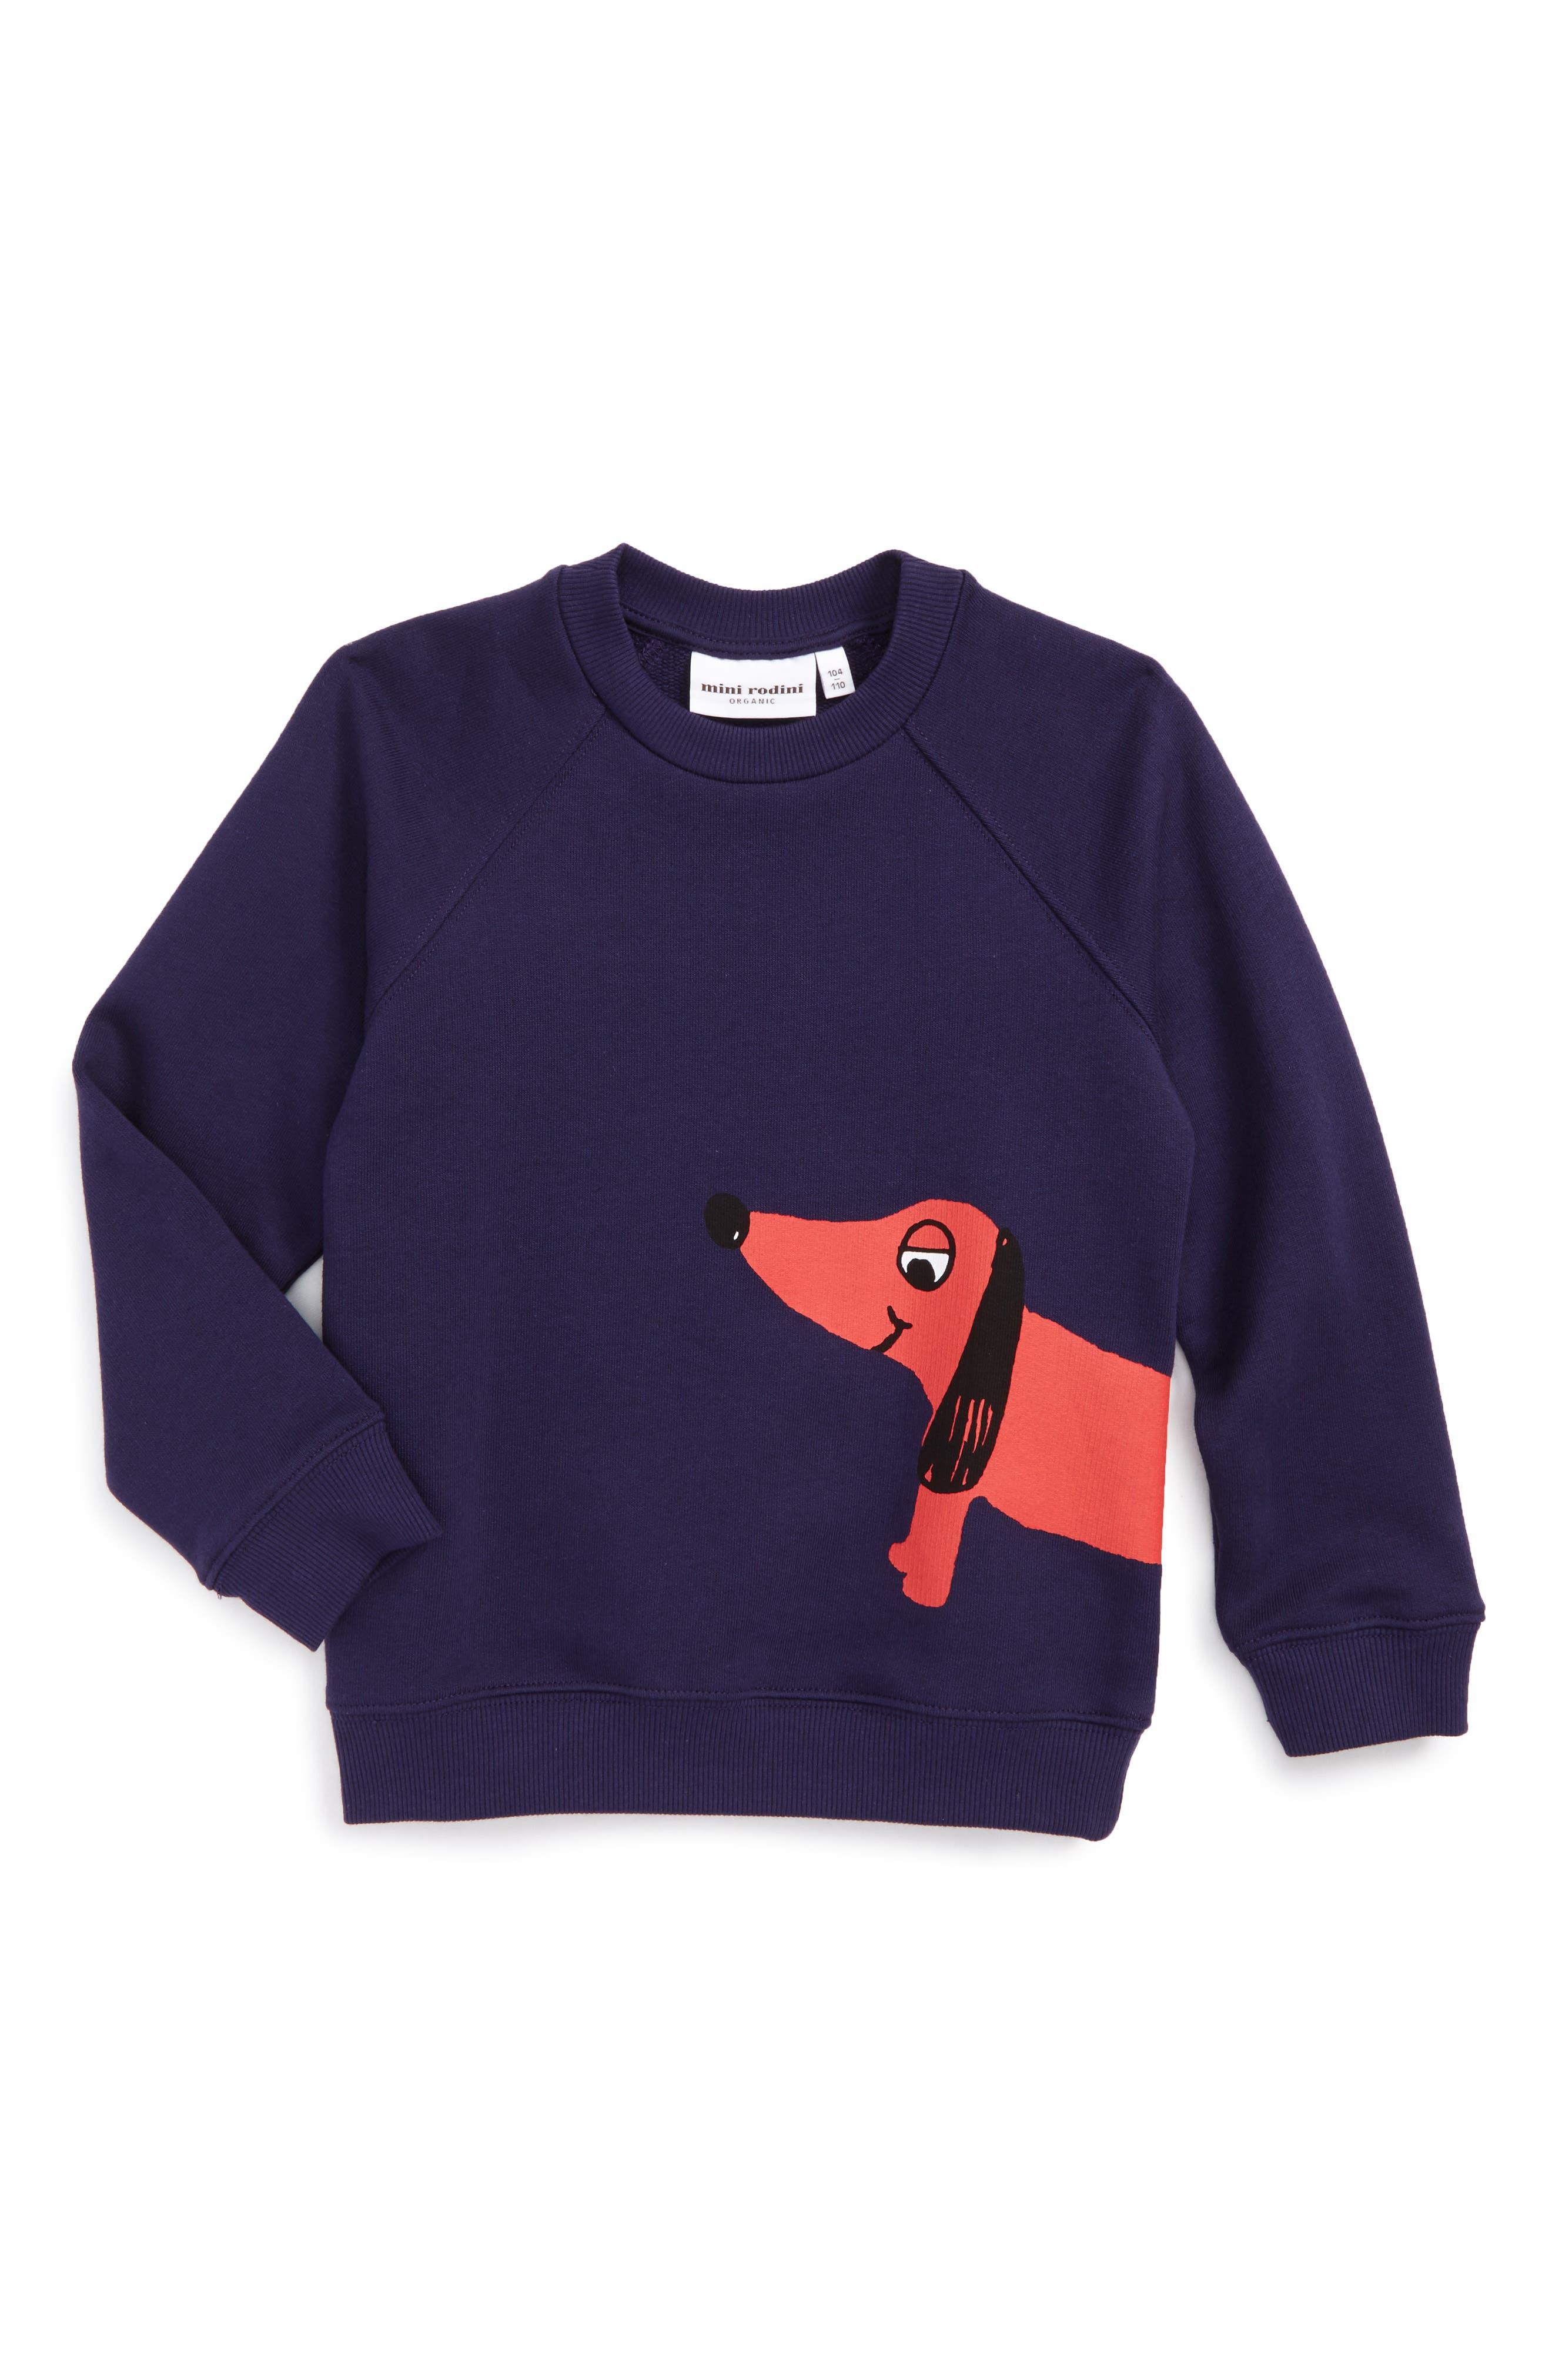 Dog Sweatshirt,                             Main thumbnail 1, color,                             410